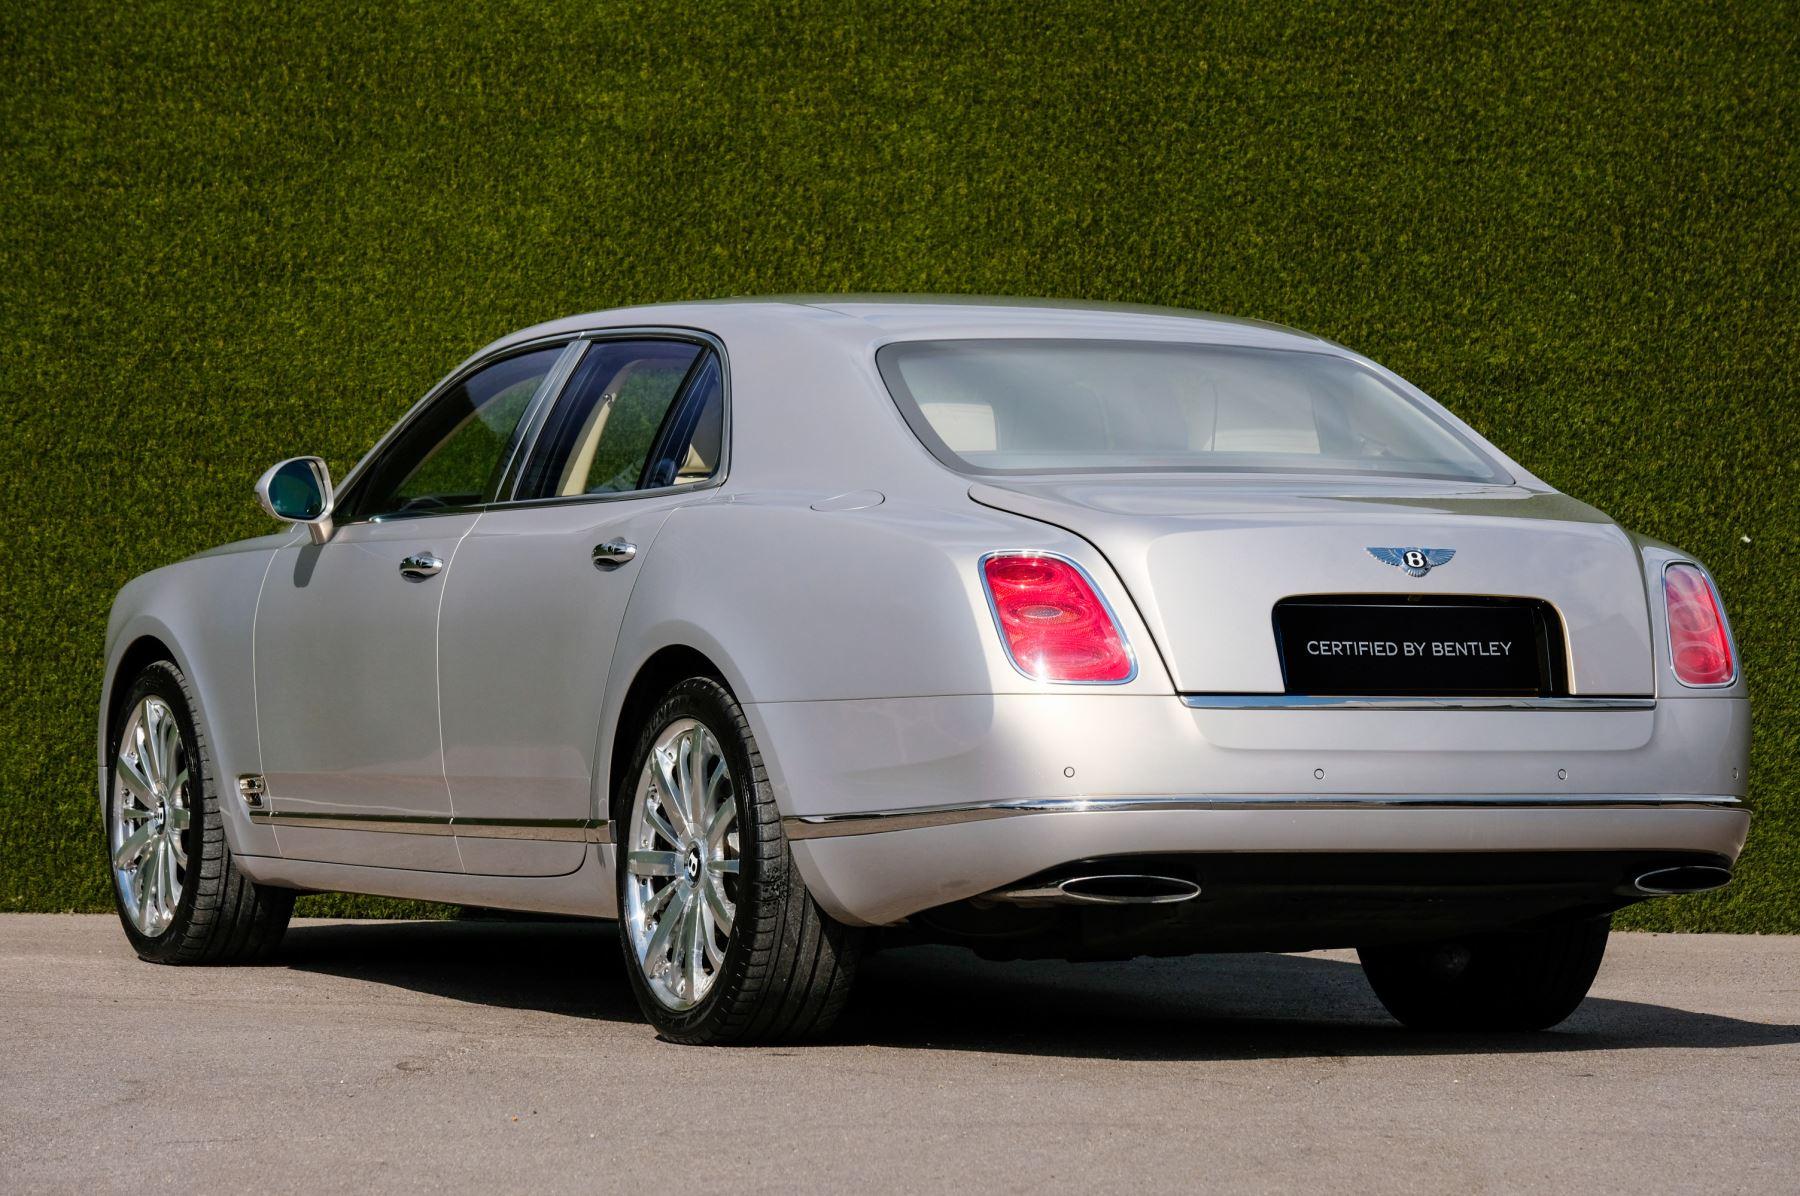 Bentley Mulsanne 6.8 V8 Mulliner Driving Spec - Naim For Bentley Premium Audio image 5